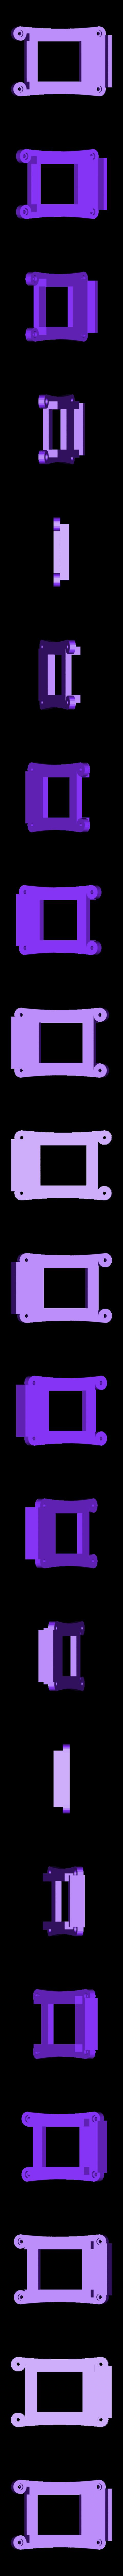 Quad 90mm  tiny whoop TPU lipo 300 mha V2.stl Download free STL file Indestructible Tiny Whoop TPU 90mm 2S • 3D printable model, Microdure